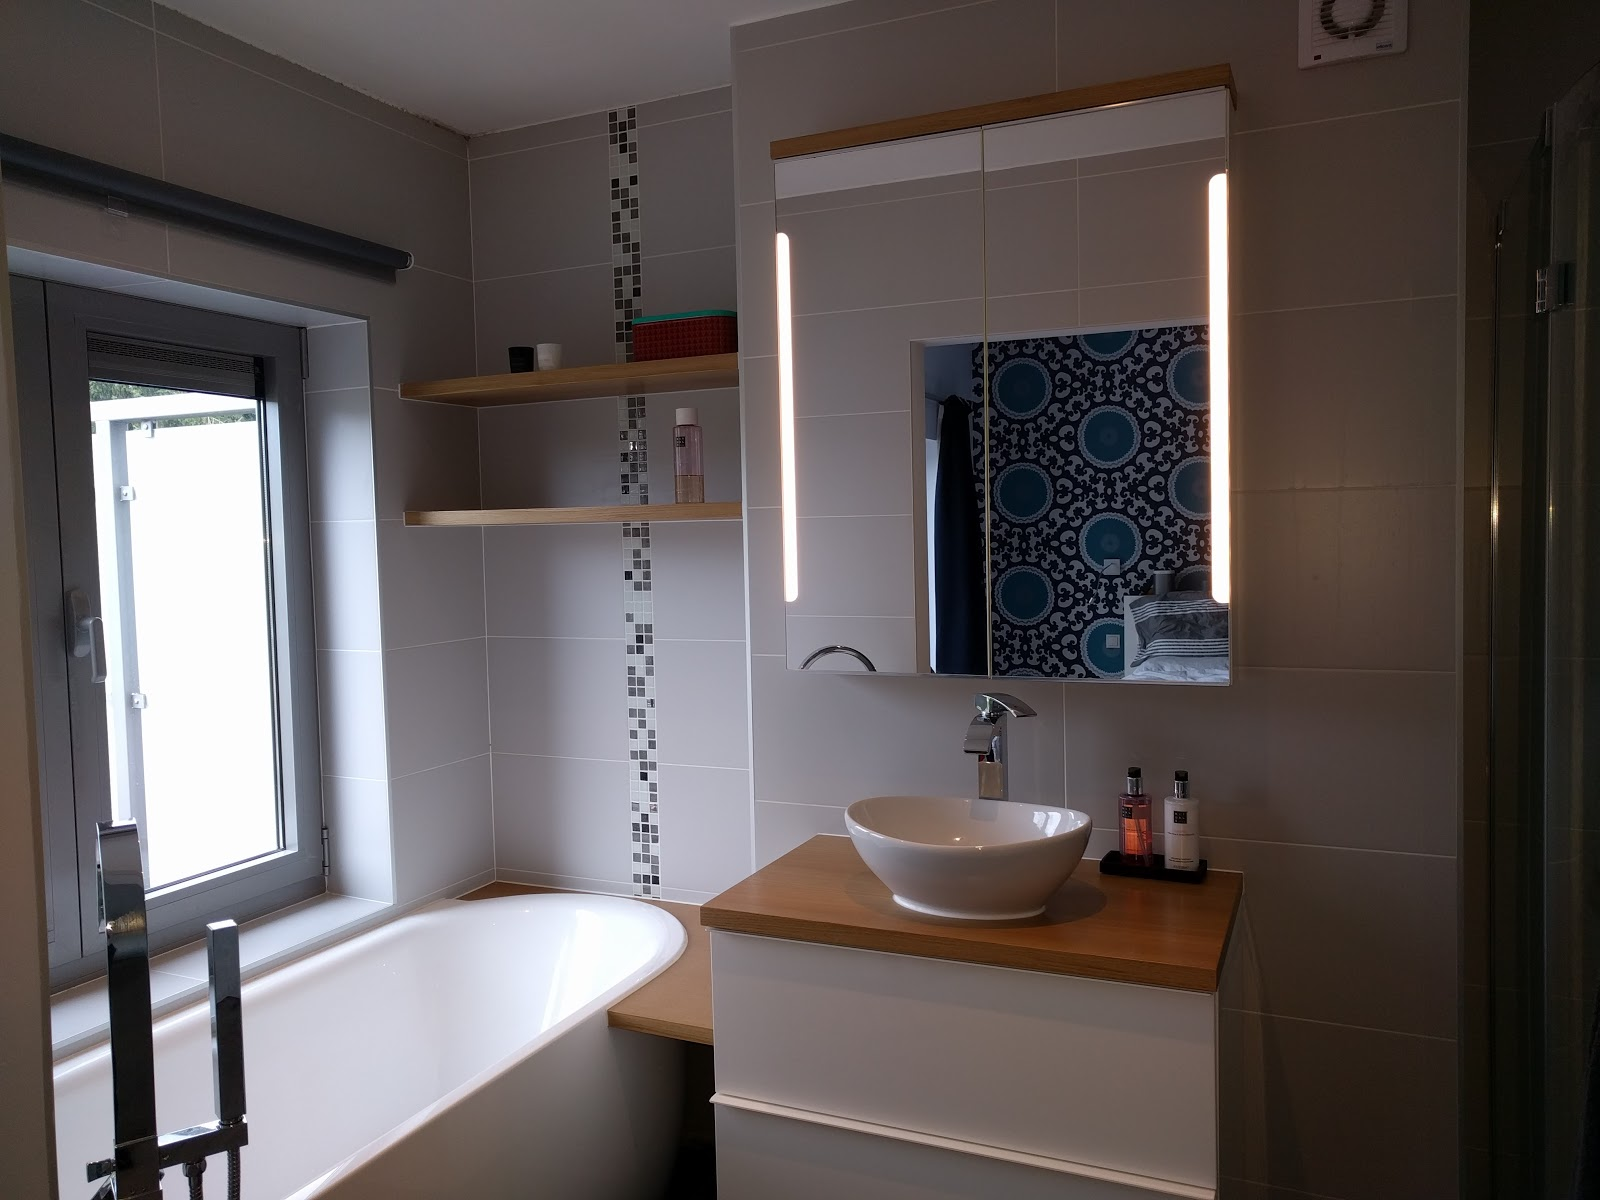 Ons Huisje: Badkamer afgewerkt